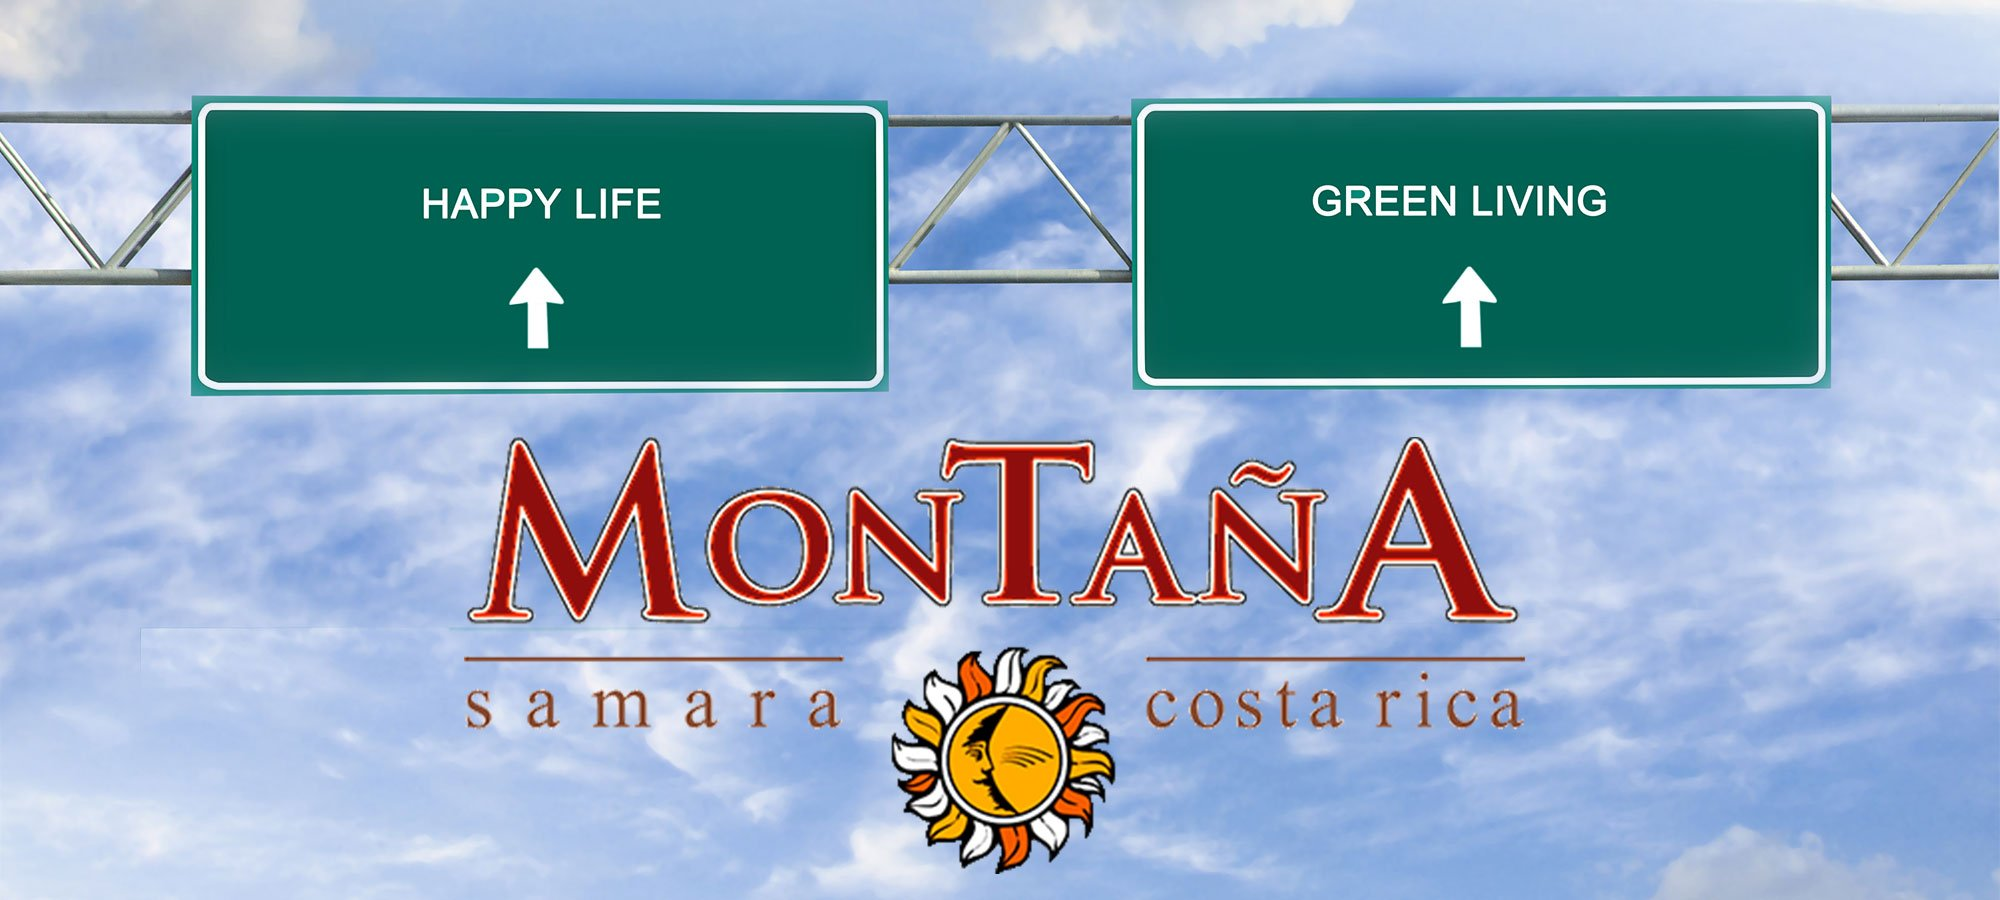 Living Green in Samara Costa Rica